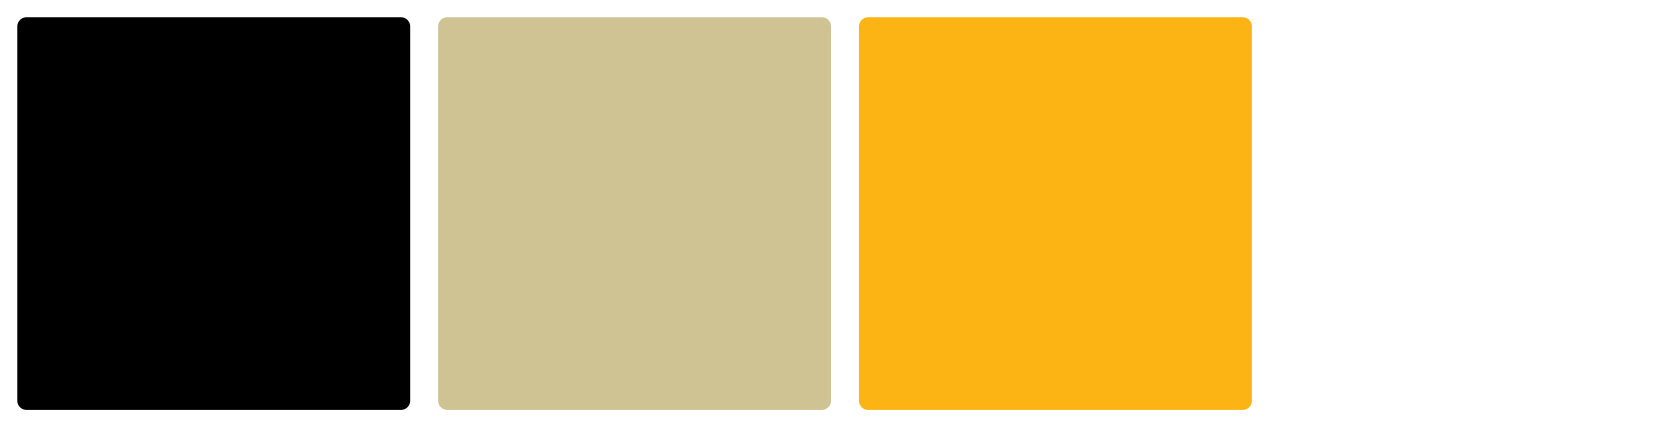 Pittsburgh Penguins Color Palette Image